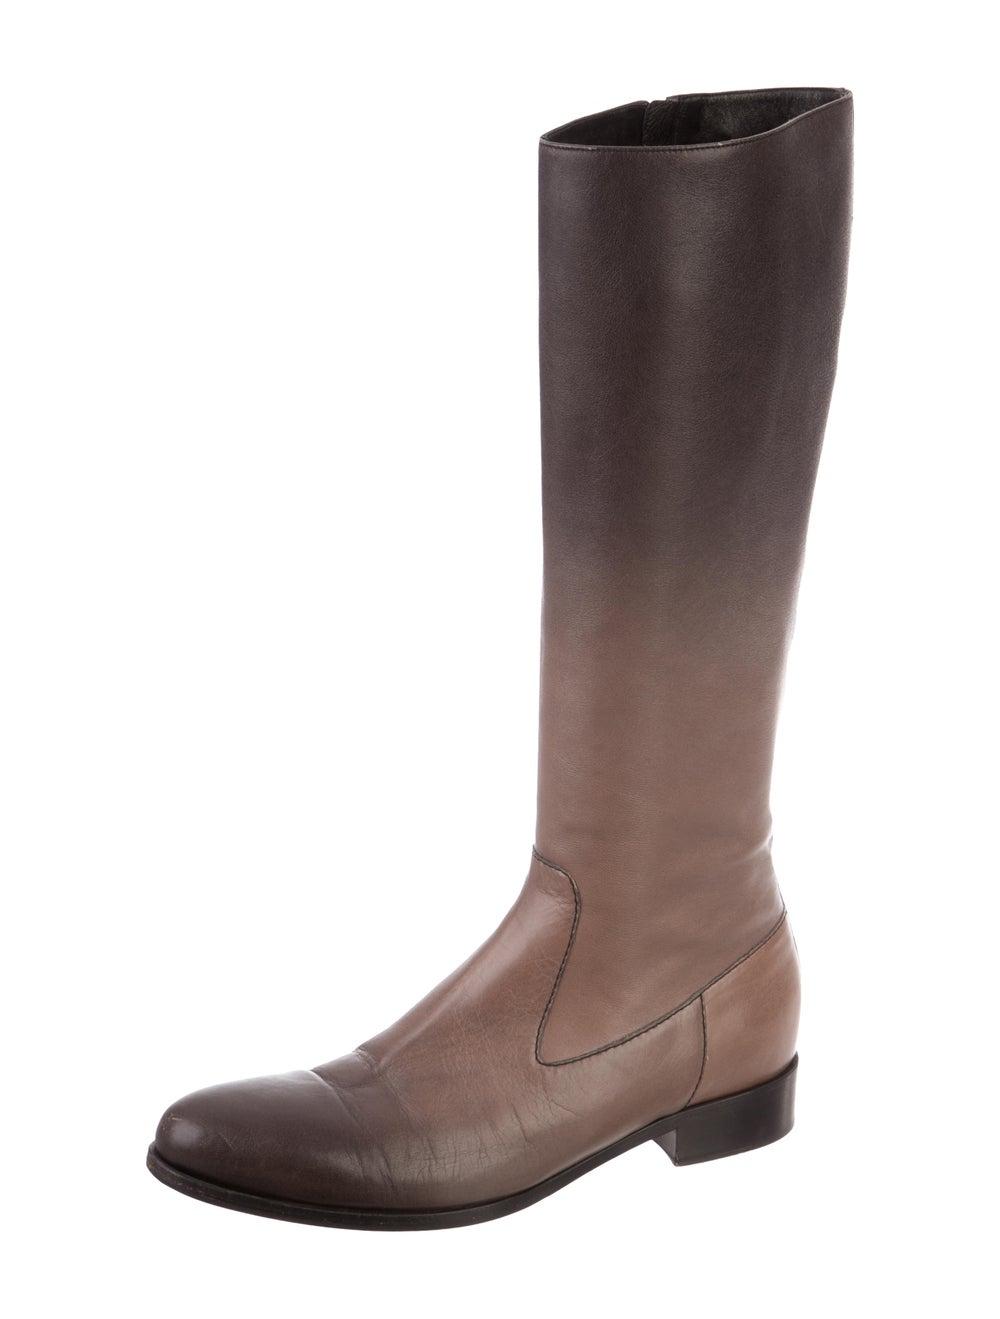 Prada Leather Knee-High Boots Brown - image 2